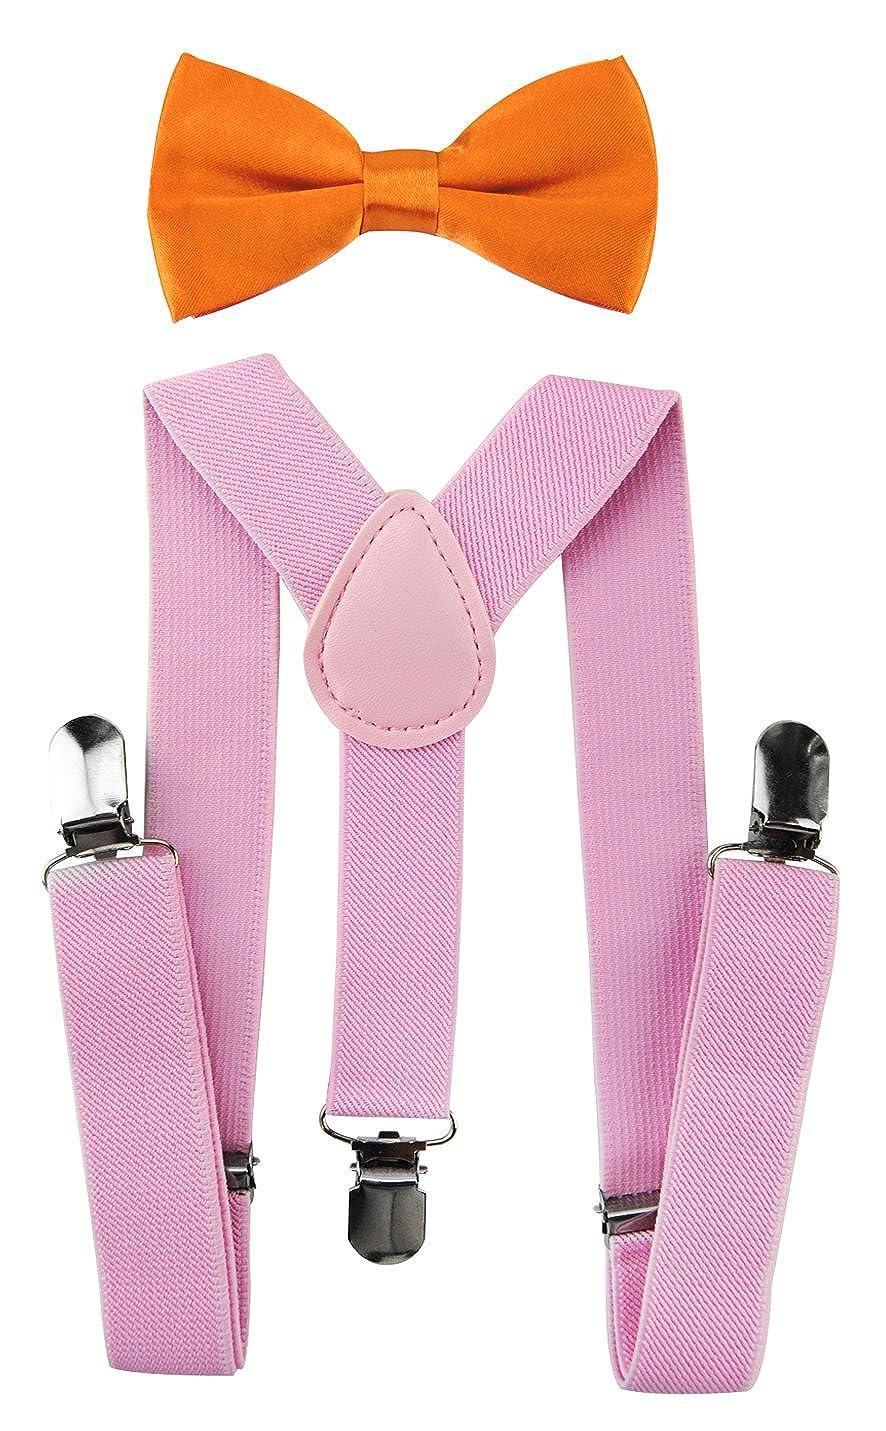 axy Kinder Pink Hosenträger-Y Form mit Fliege- 3 Clips EXTRA STARK HTKS25-PIN